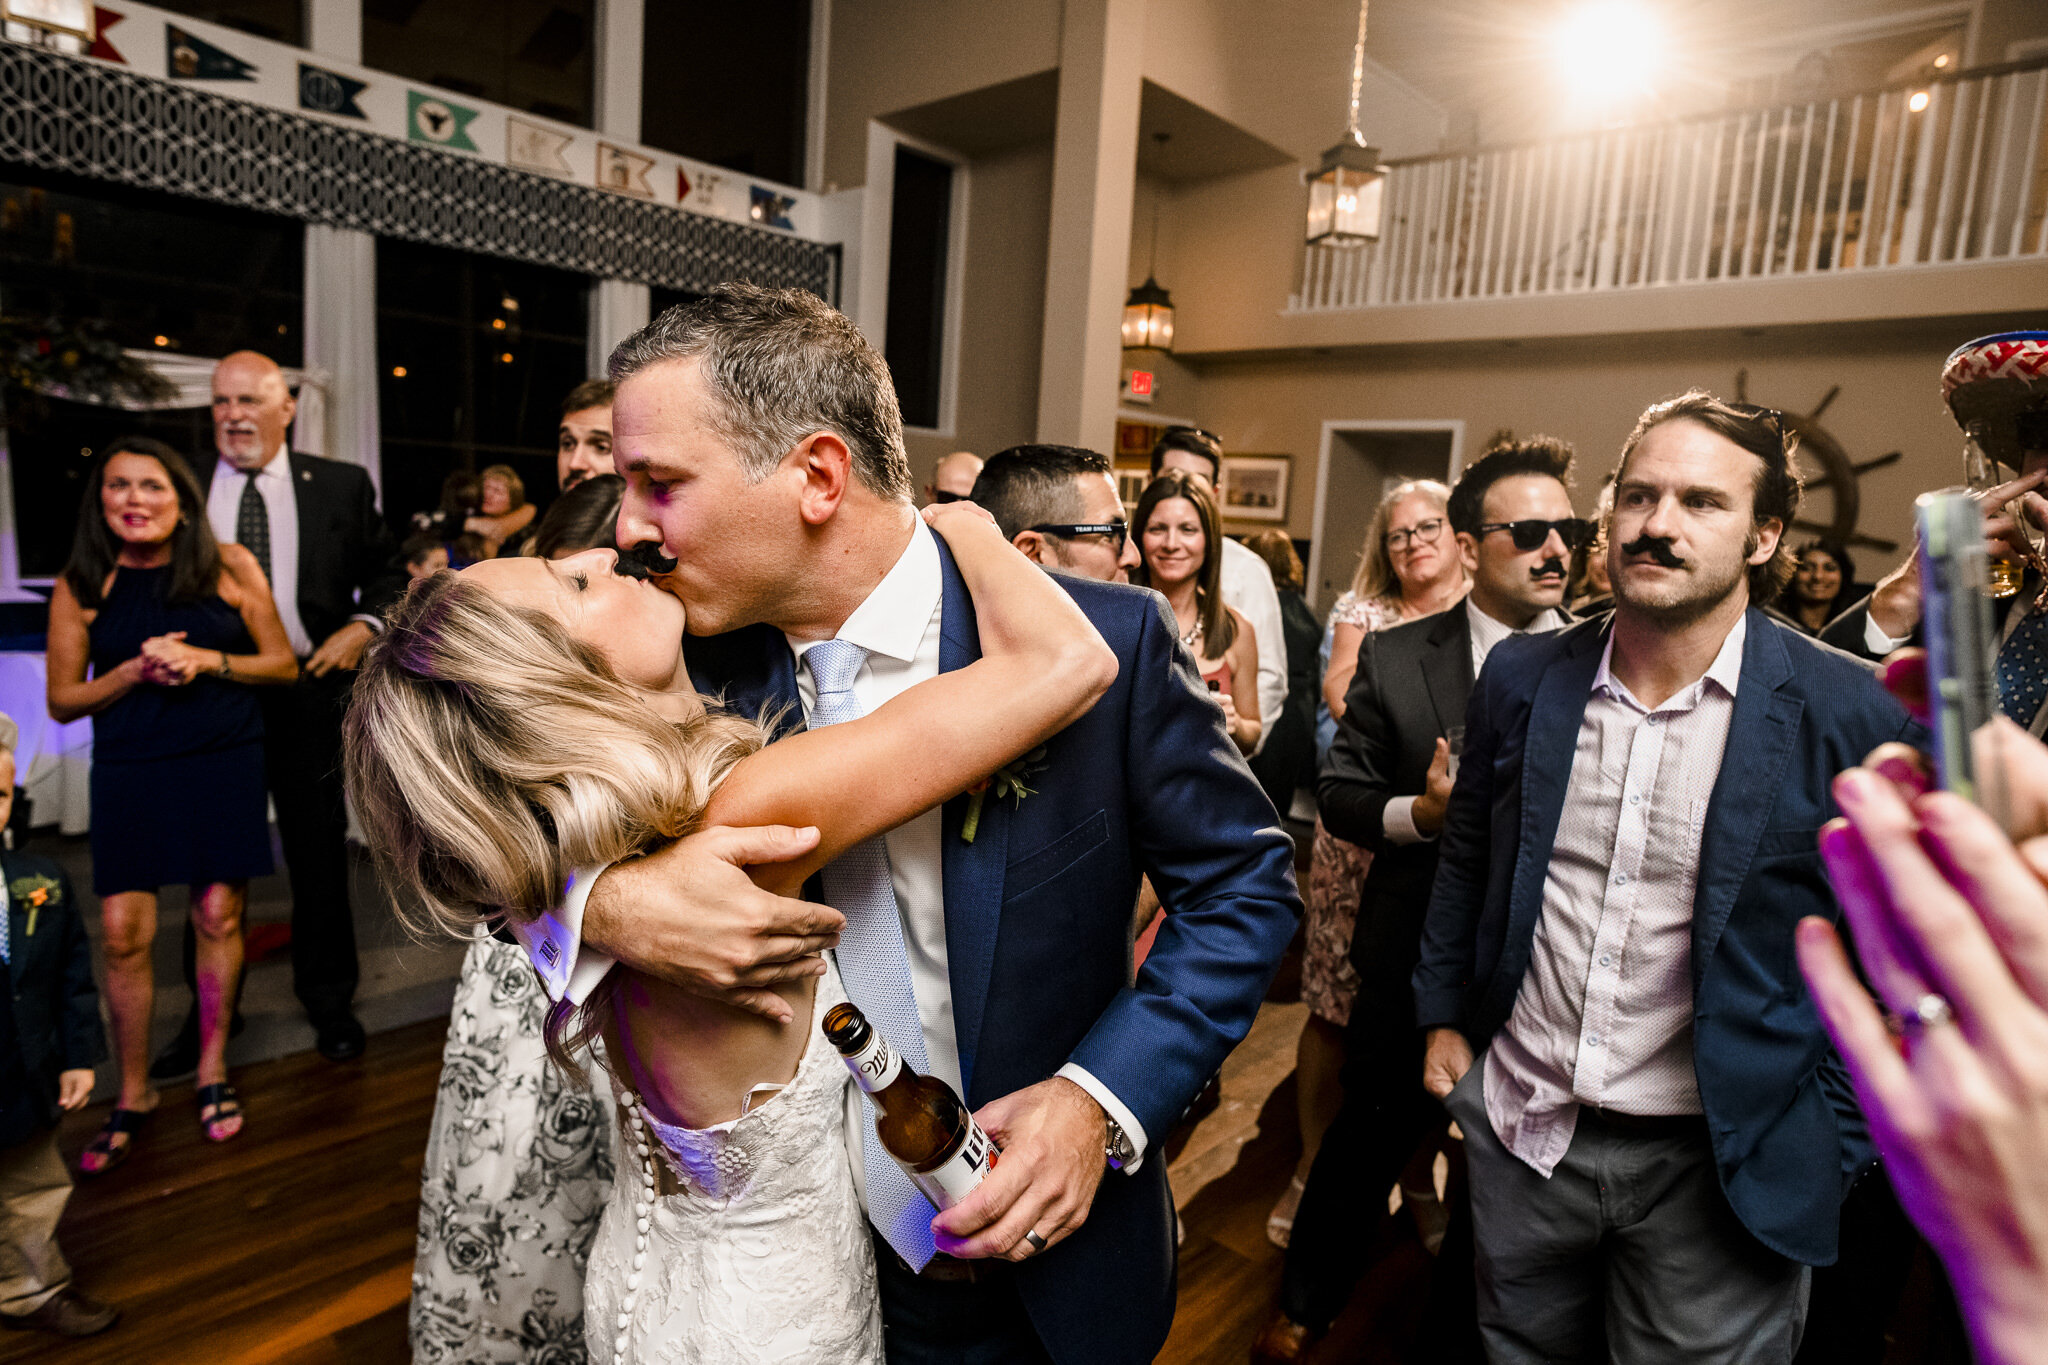 Snell-Ocean-City-Yacht-Club-New-Jersey-Wedding-Photographer-45.JPG